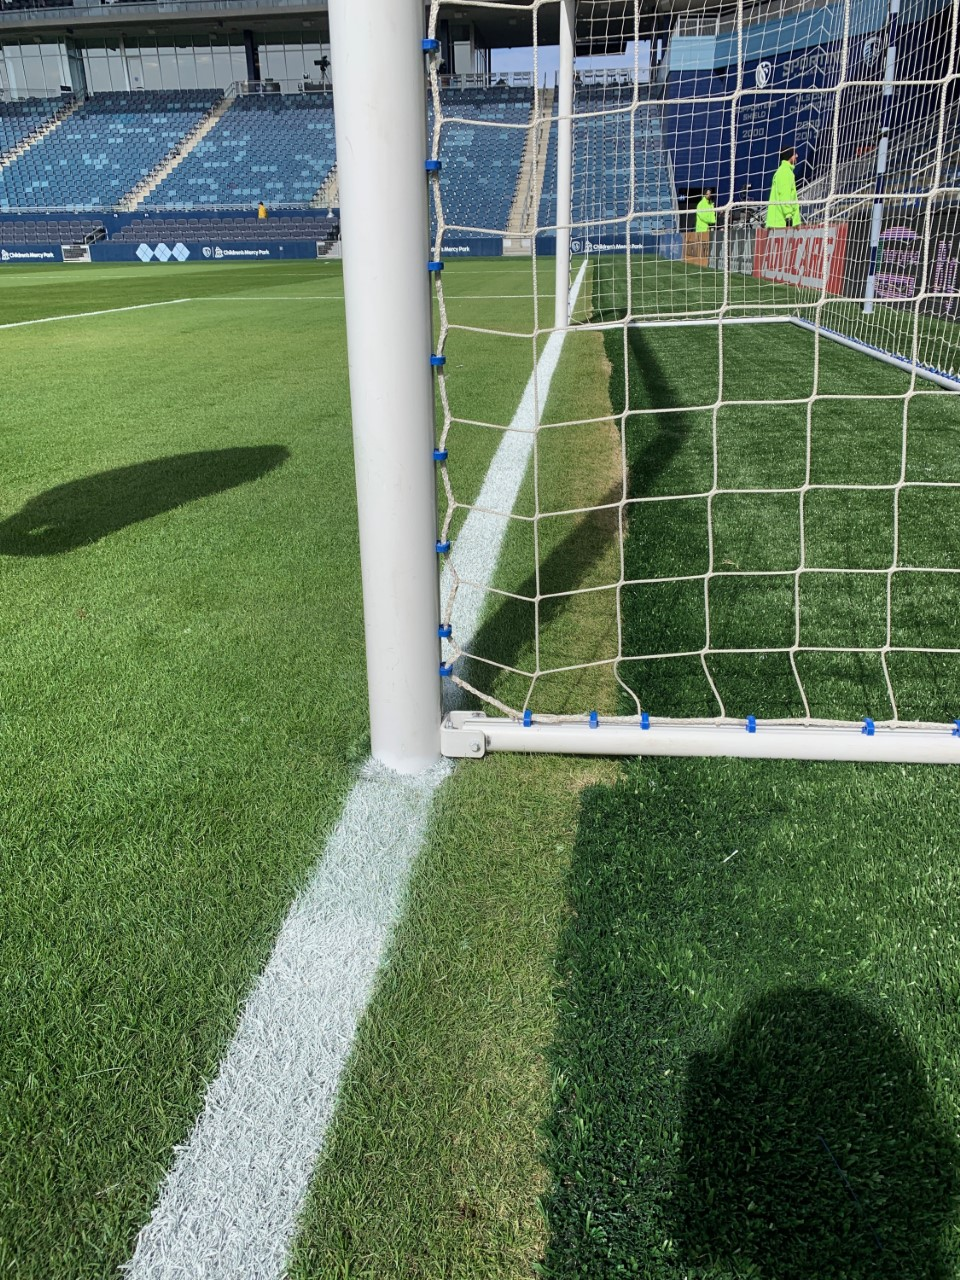 Goal line - Sporting Kansas City